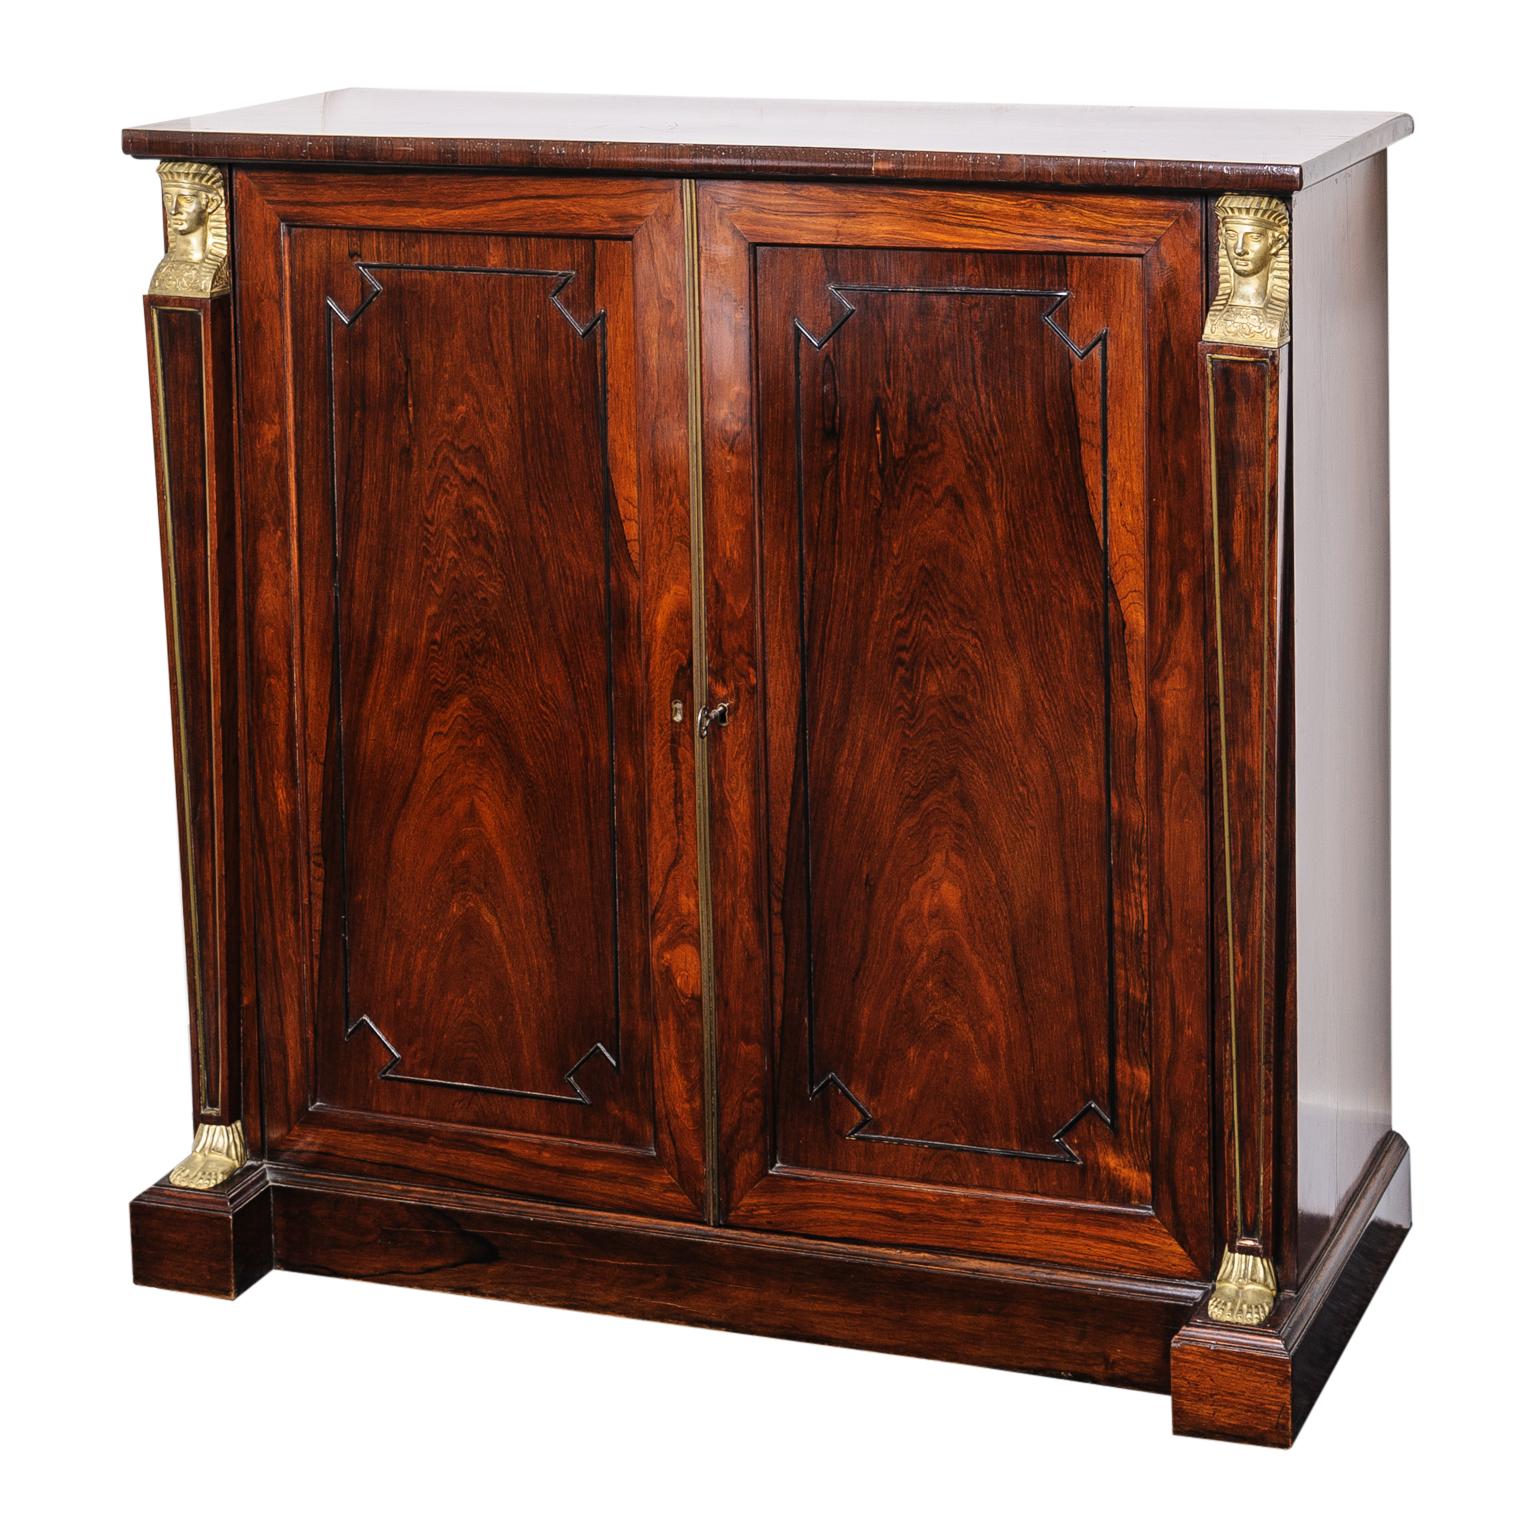 19th Century English Regency, Two-Door Cabinet, Rosewood